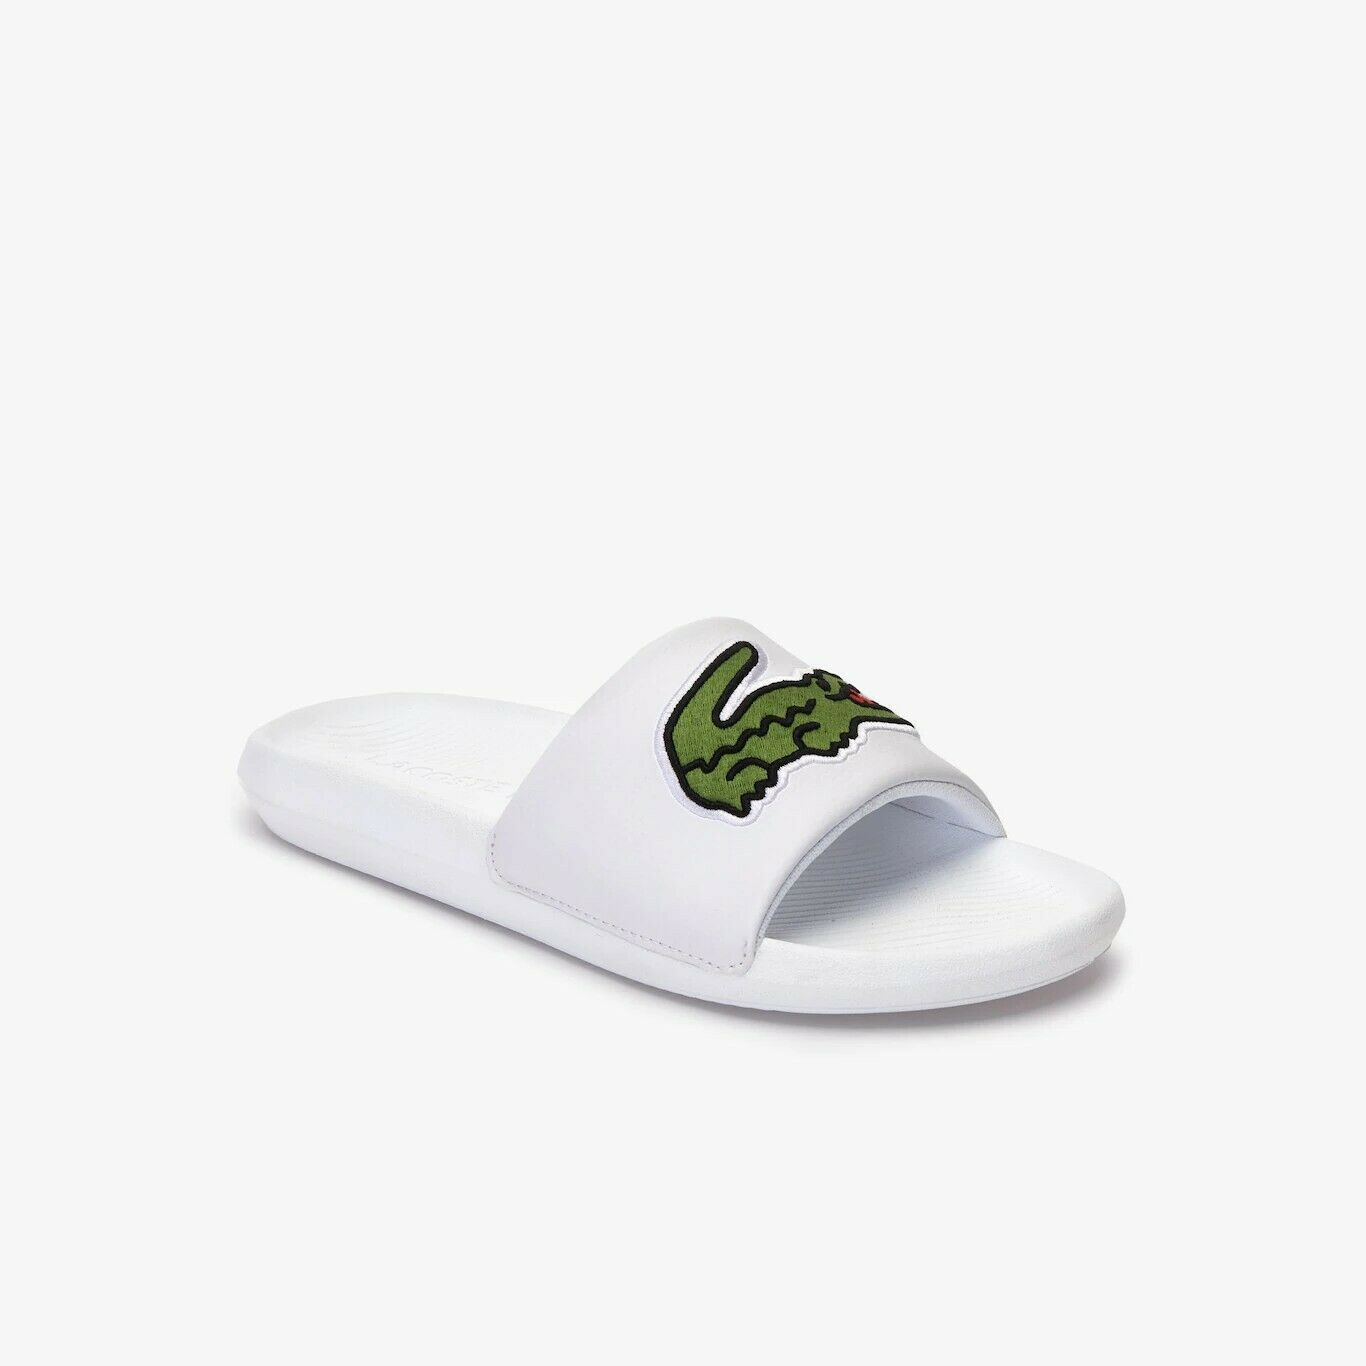 Lacoste Croco Sliders UK Size 6